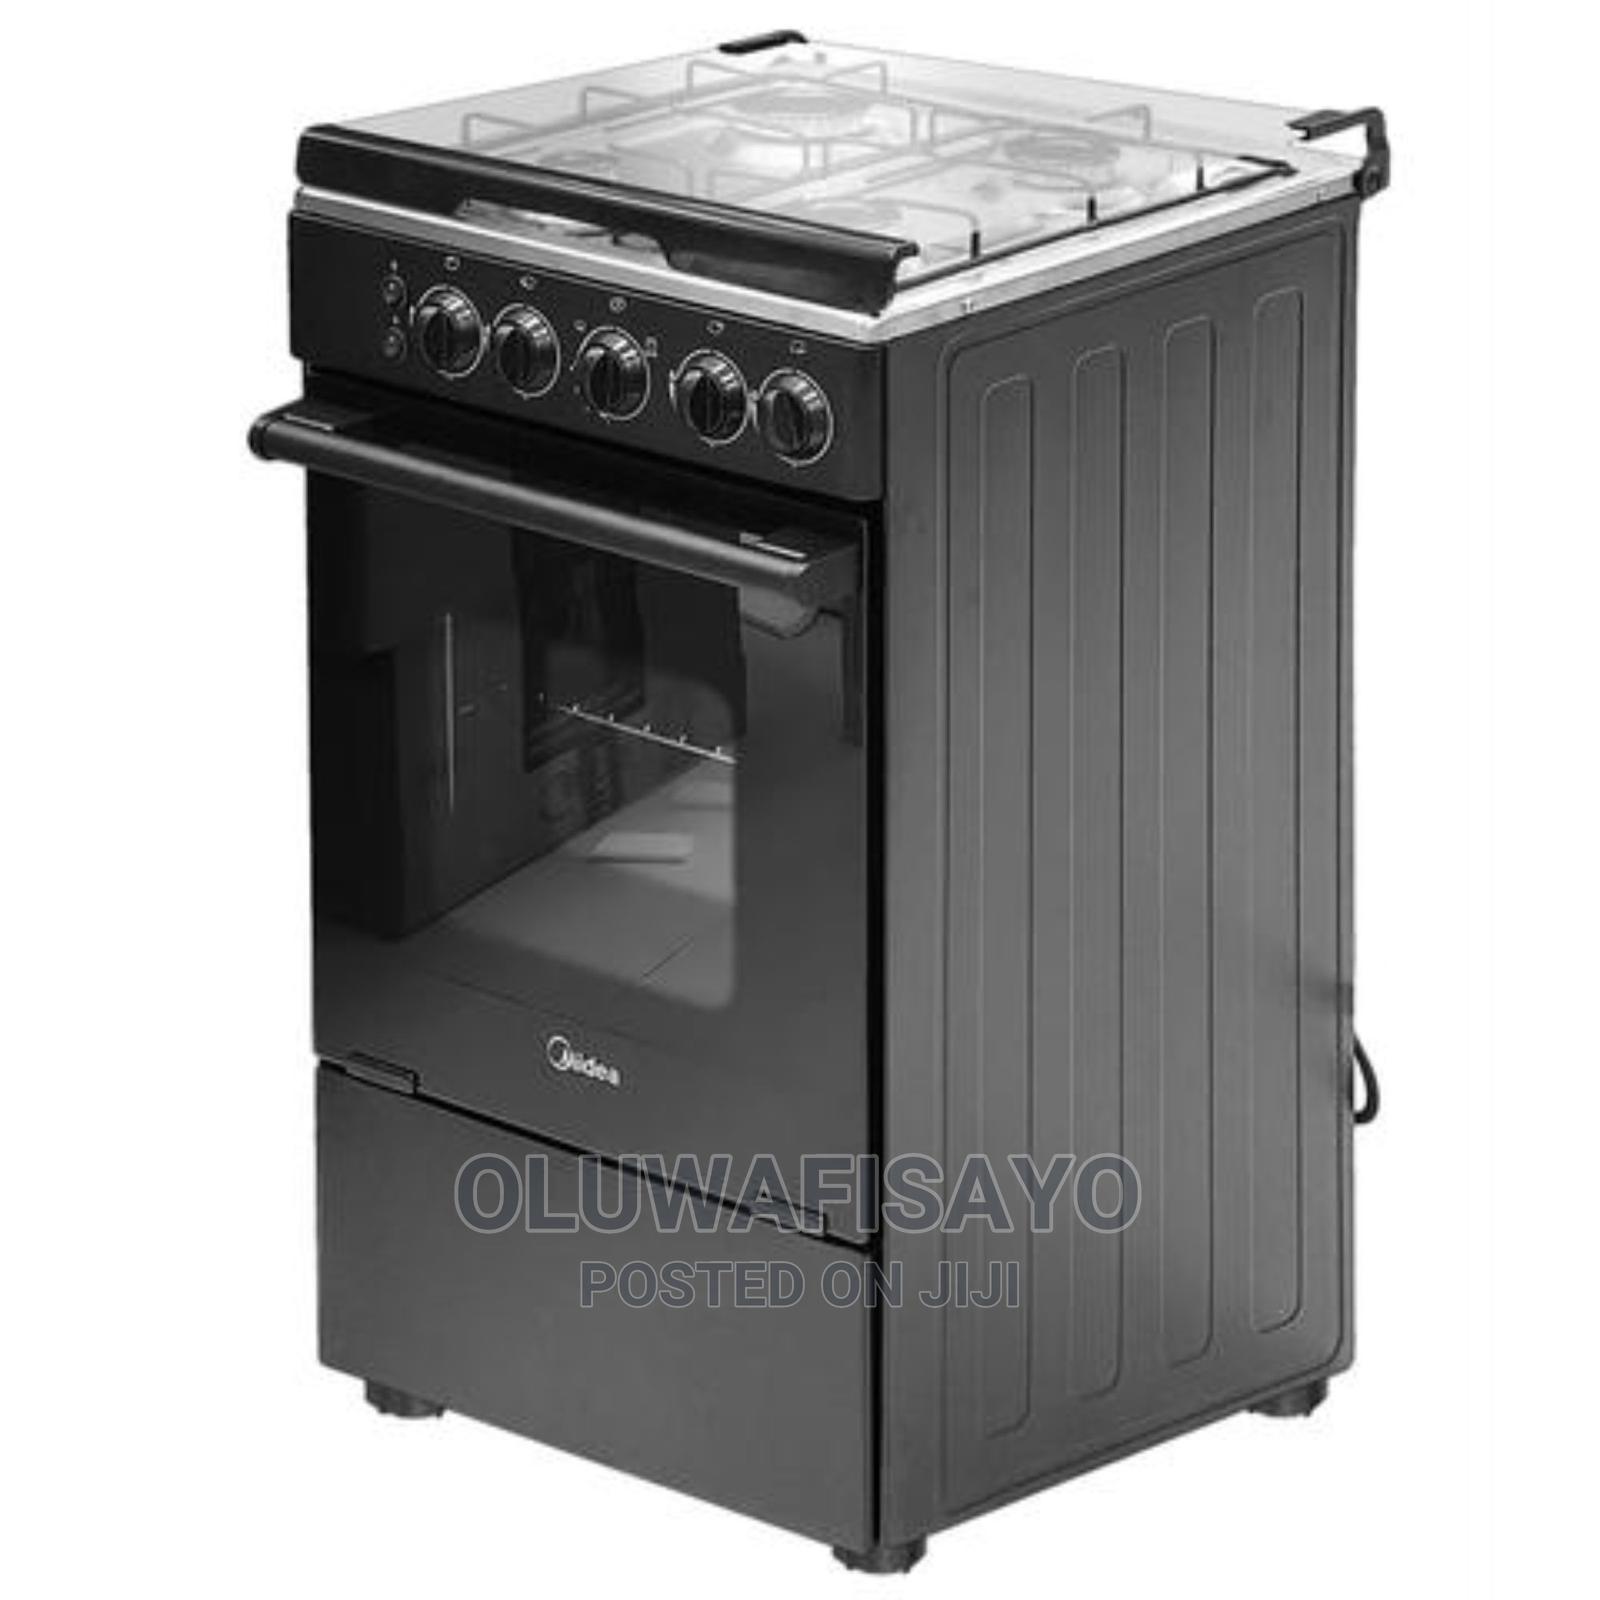 Midea 4 Burner Gas Cooker + Oven + Grill, 20bmg4g007-B | Kitchen Appliances for sale in Ogudu, Lagos State, Nigeria